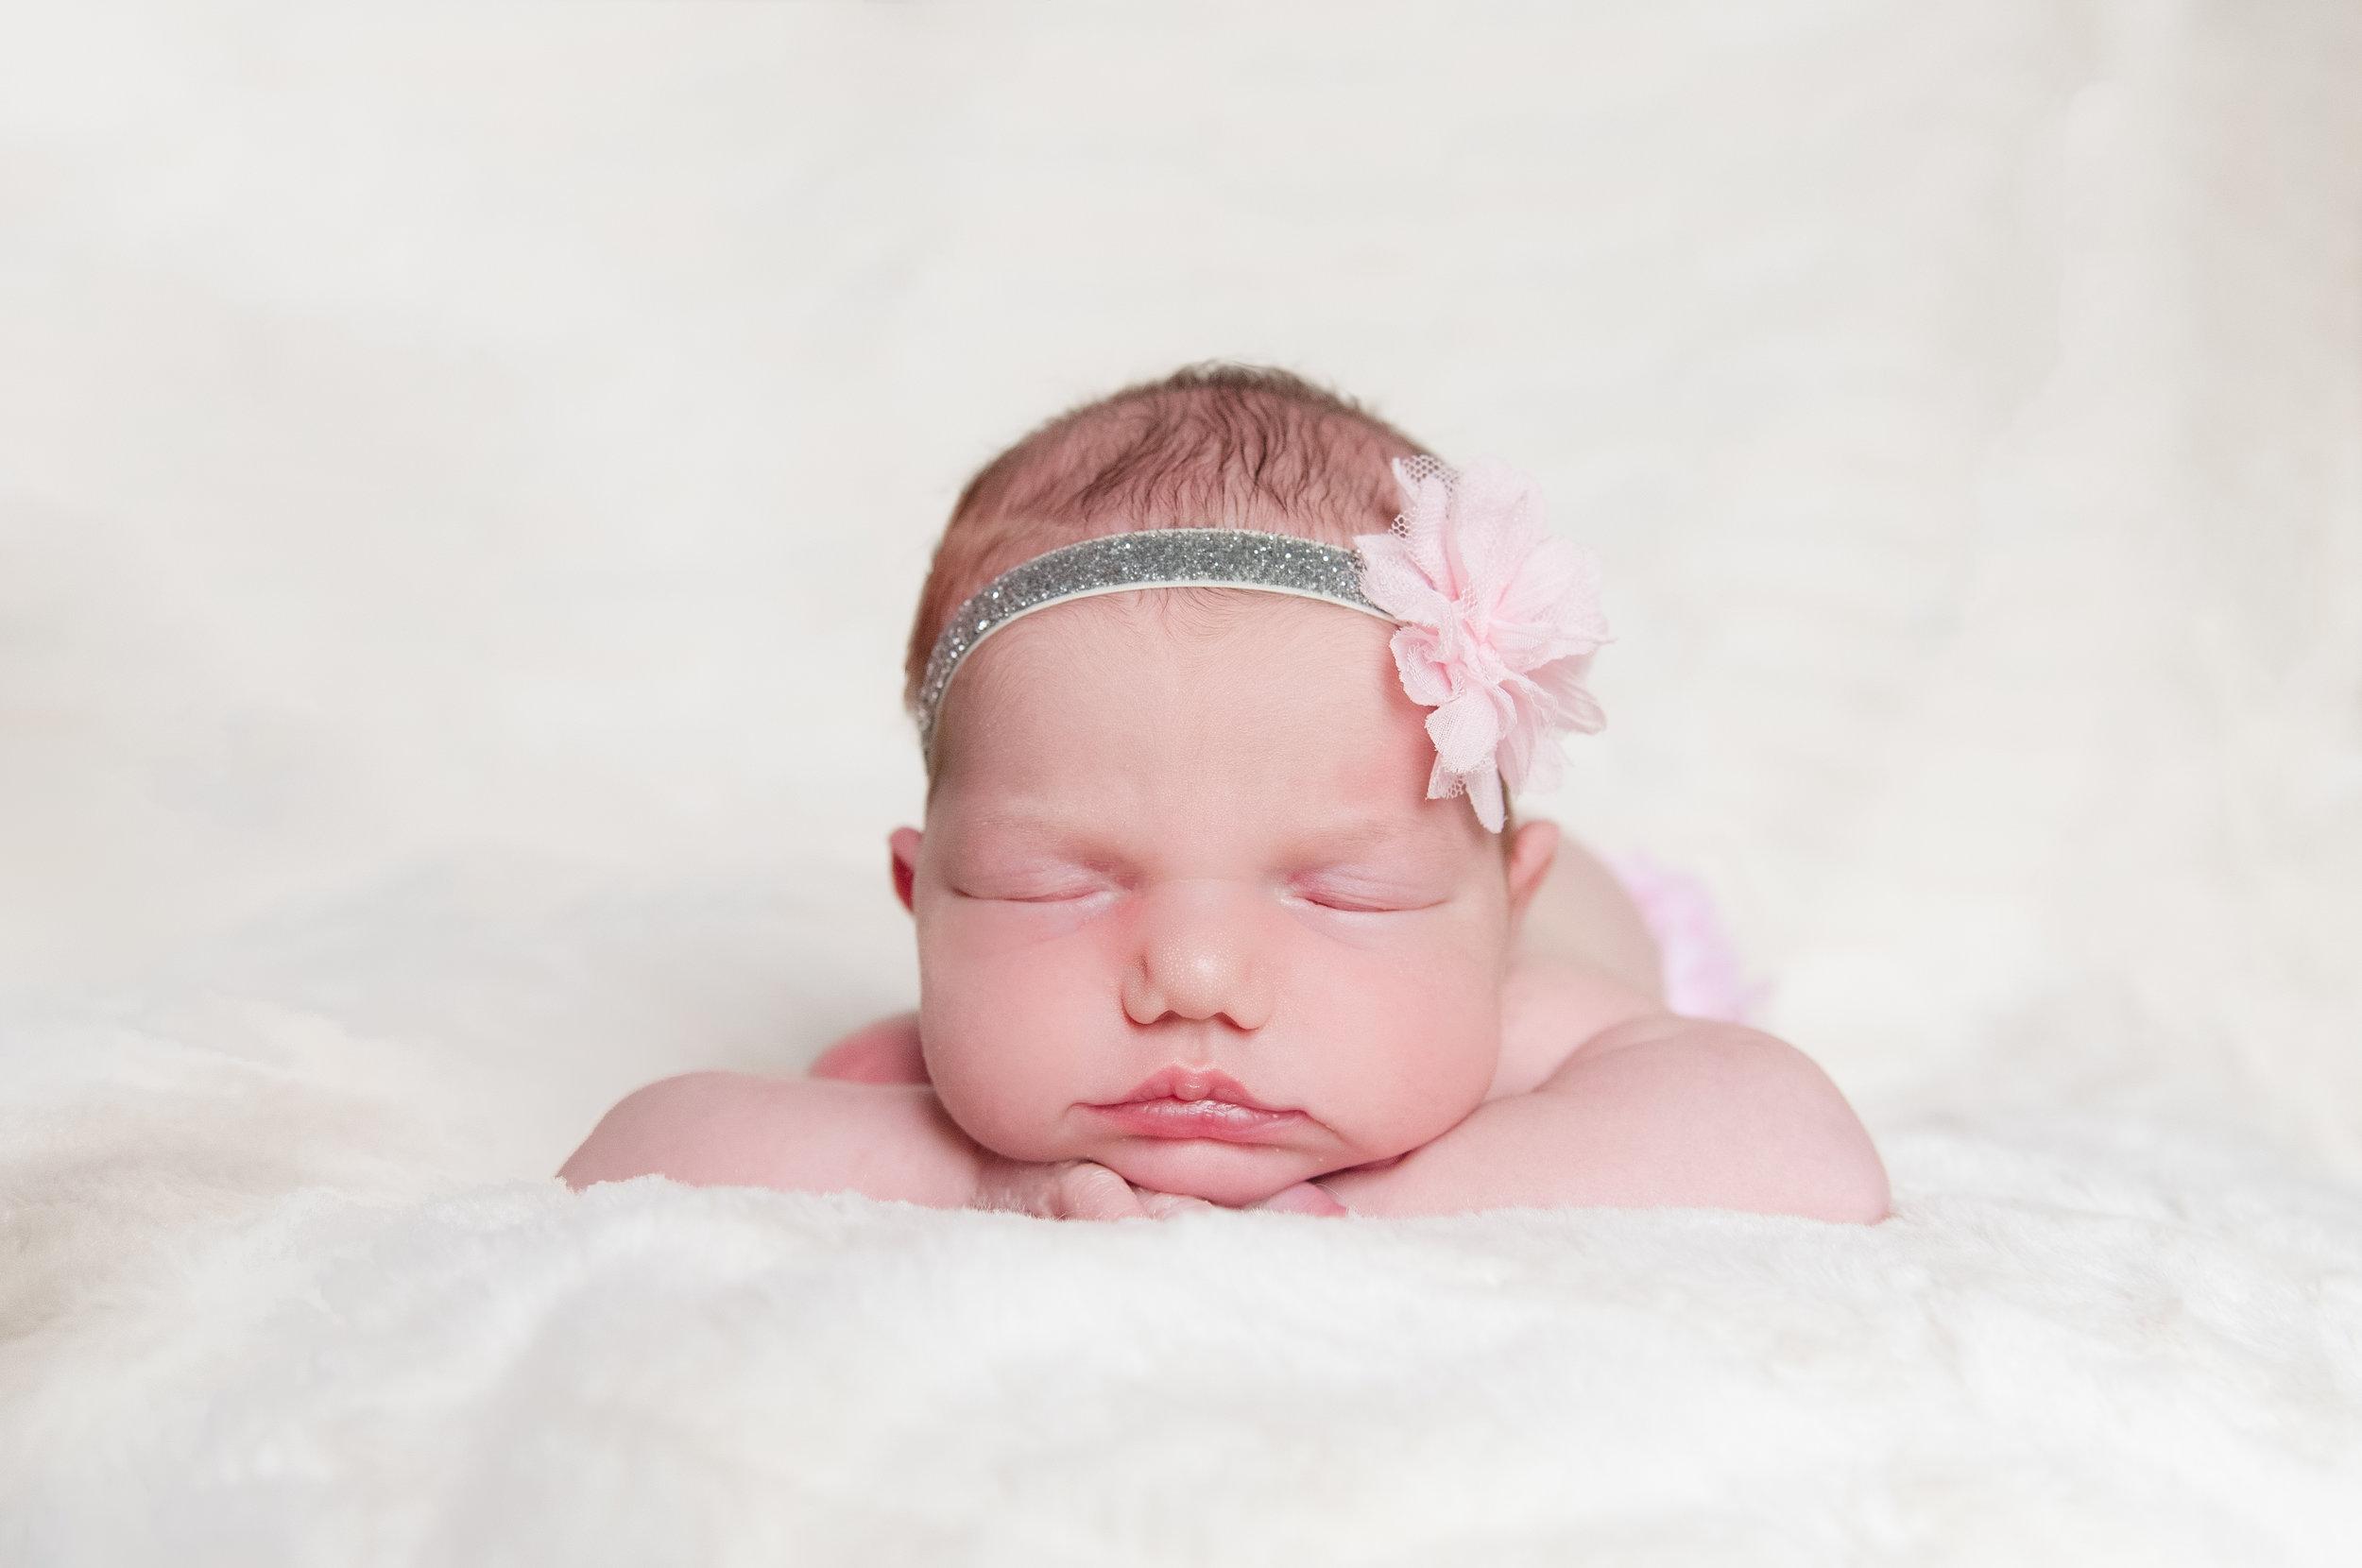 BabyDorothy-12.jpg